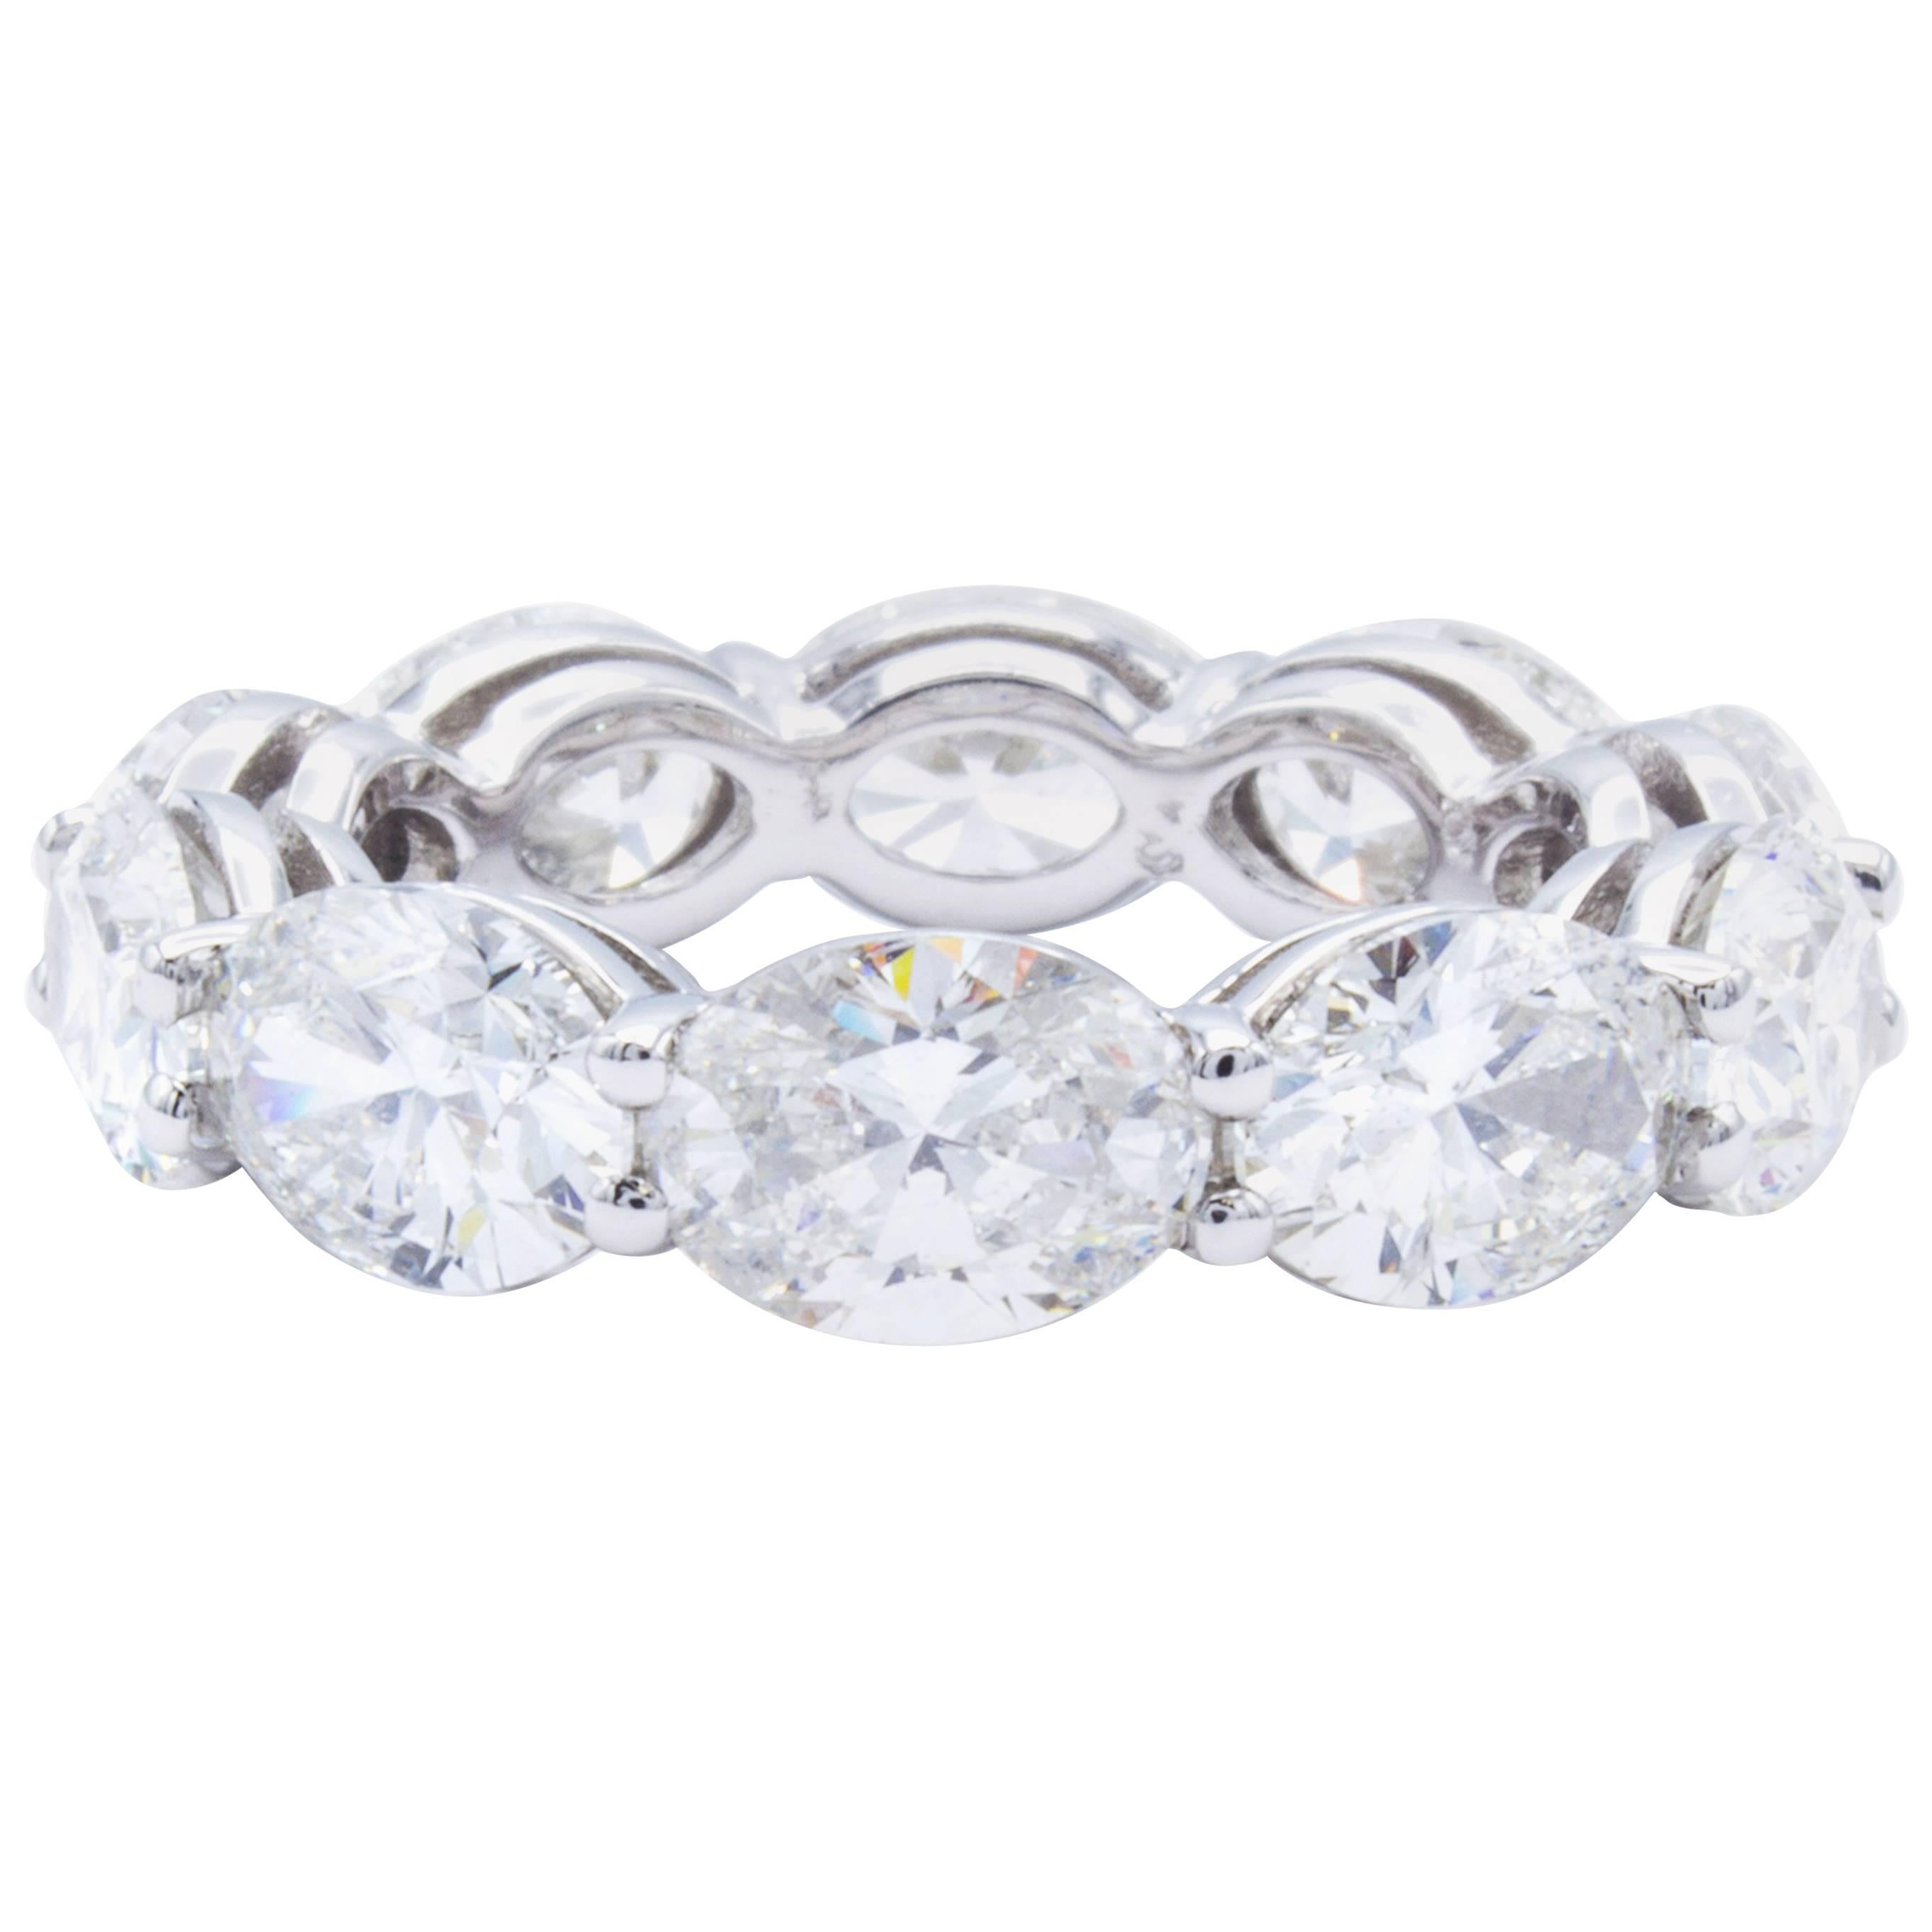 3ce2e553b11173 David Rosenberg 7.44 Carat Platinum Oval Shape Diamond Eternity Wedding Band  For Sale at 1stdibs